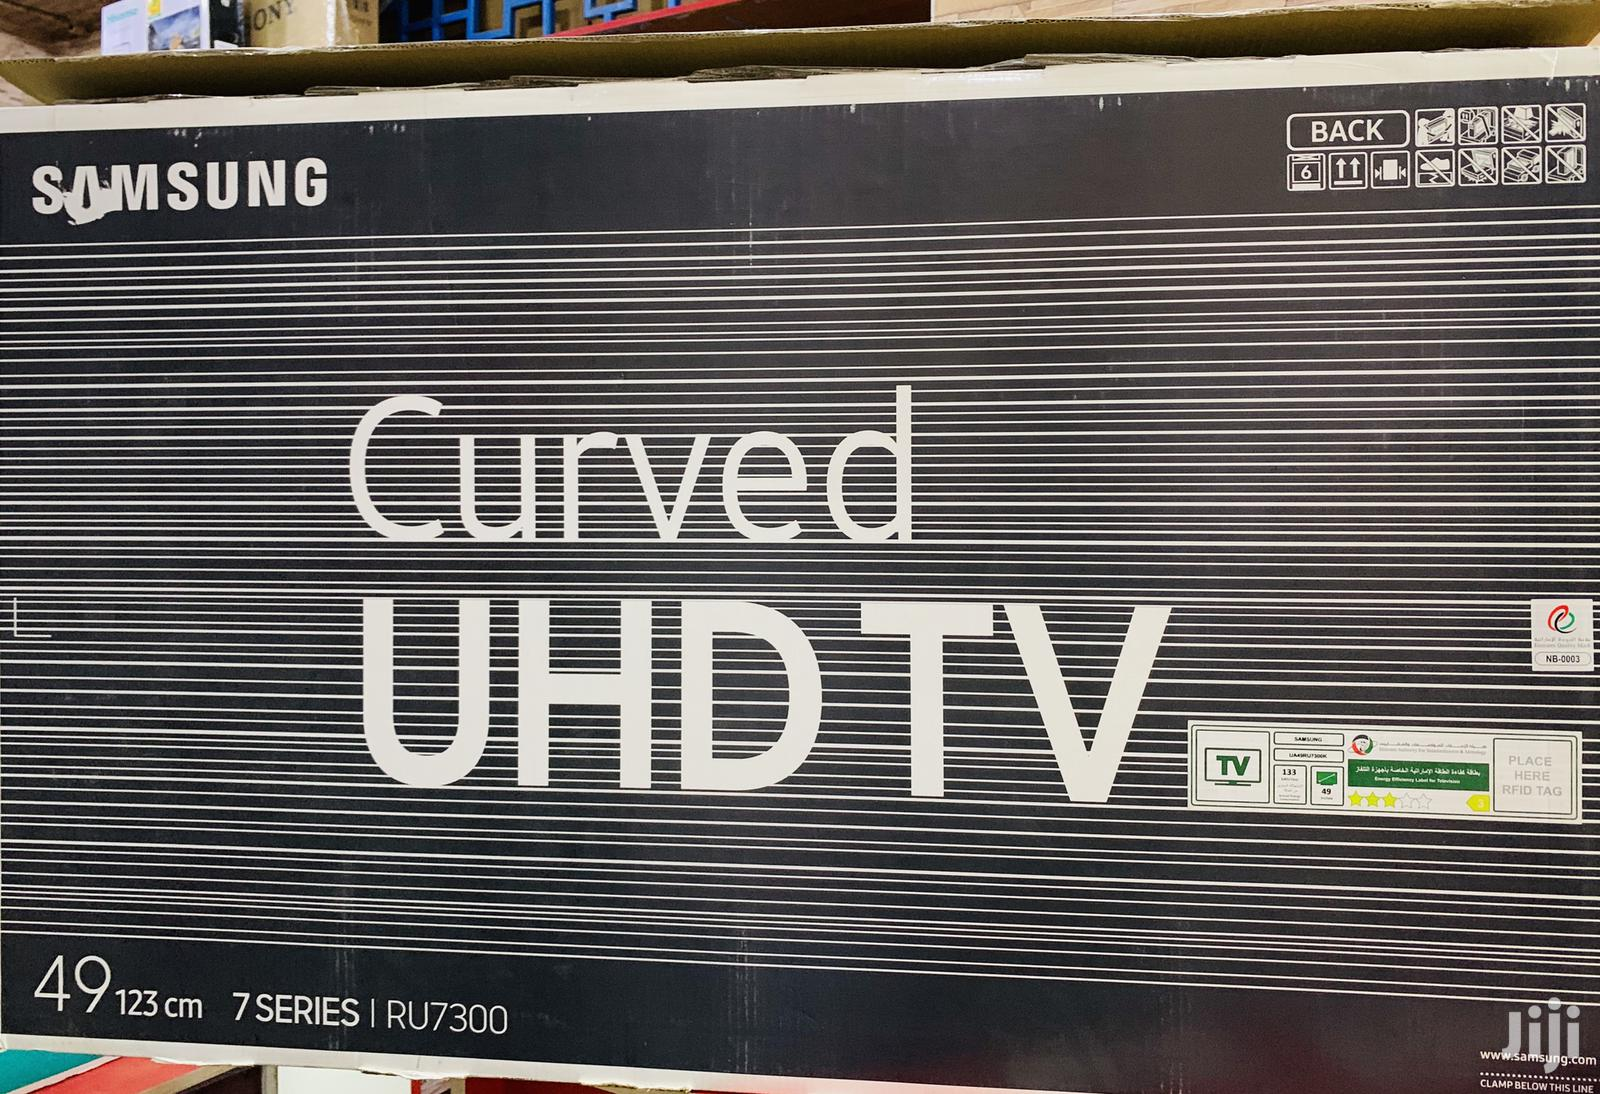 49inches Samsung Curve UHD 4K | TV & DVD Equipment for sale in Kampala, Central Region, Uganda